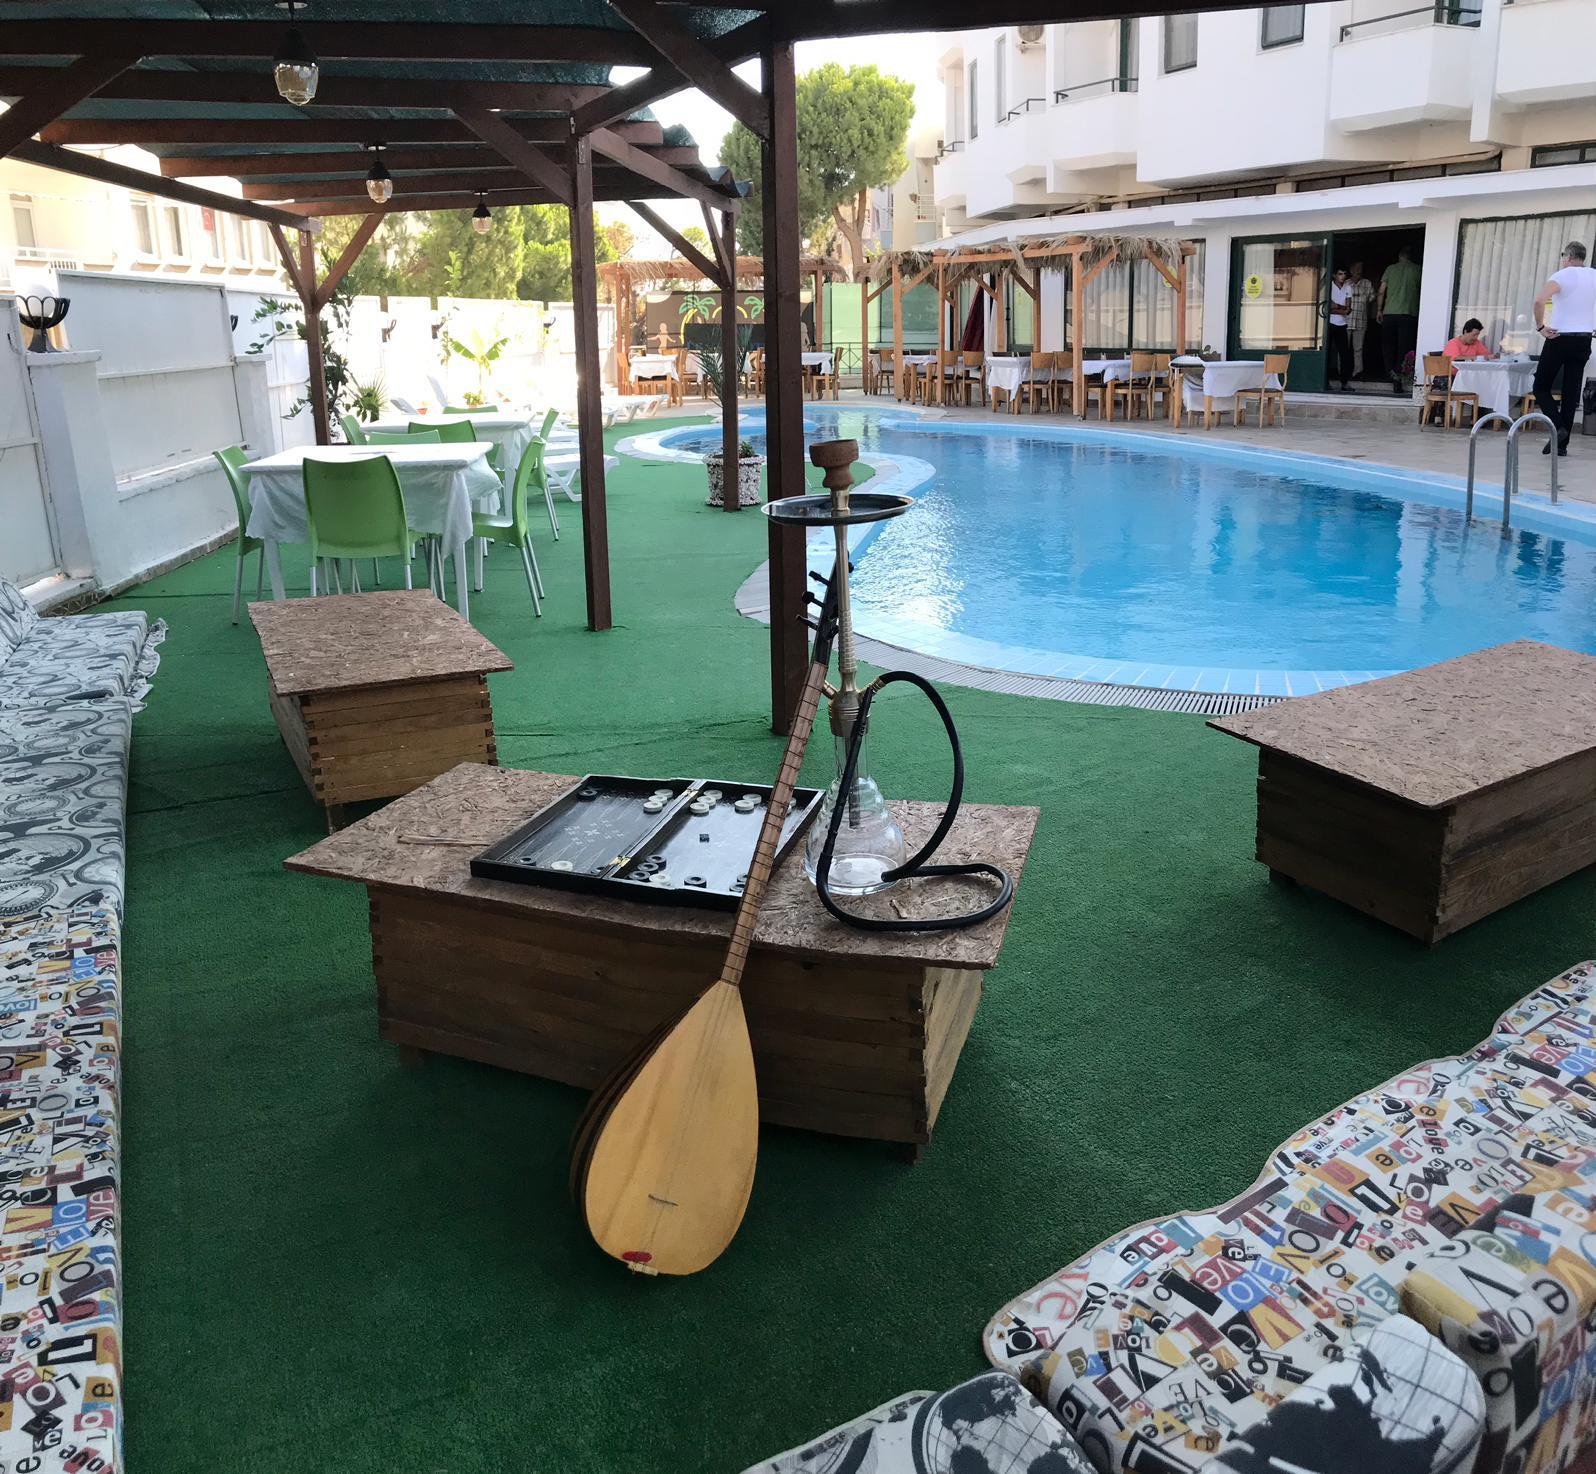 Letovanje Turska autobusom, Sarimsakli, Hotel Urgenc,bar